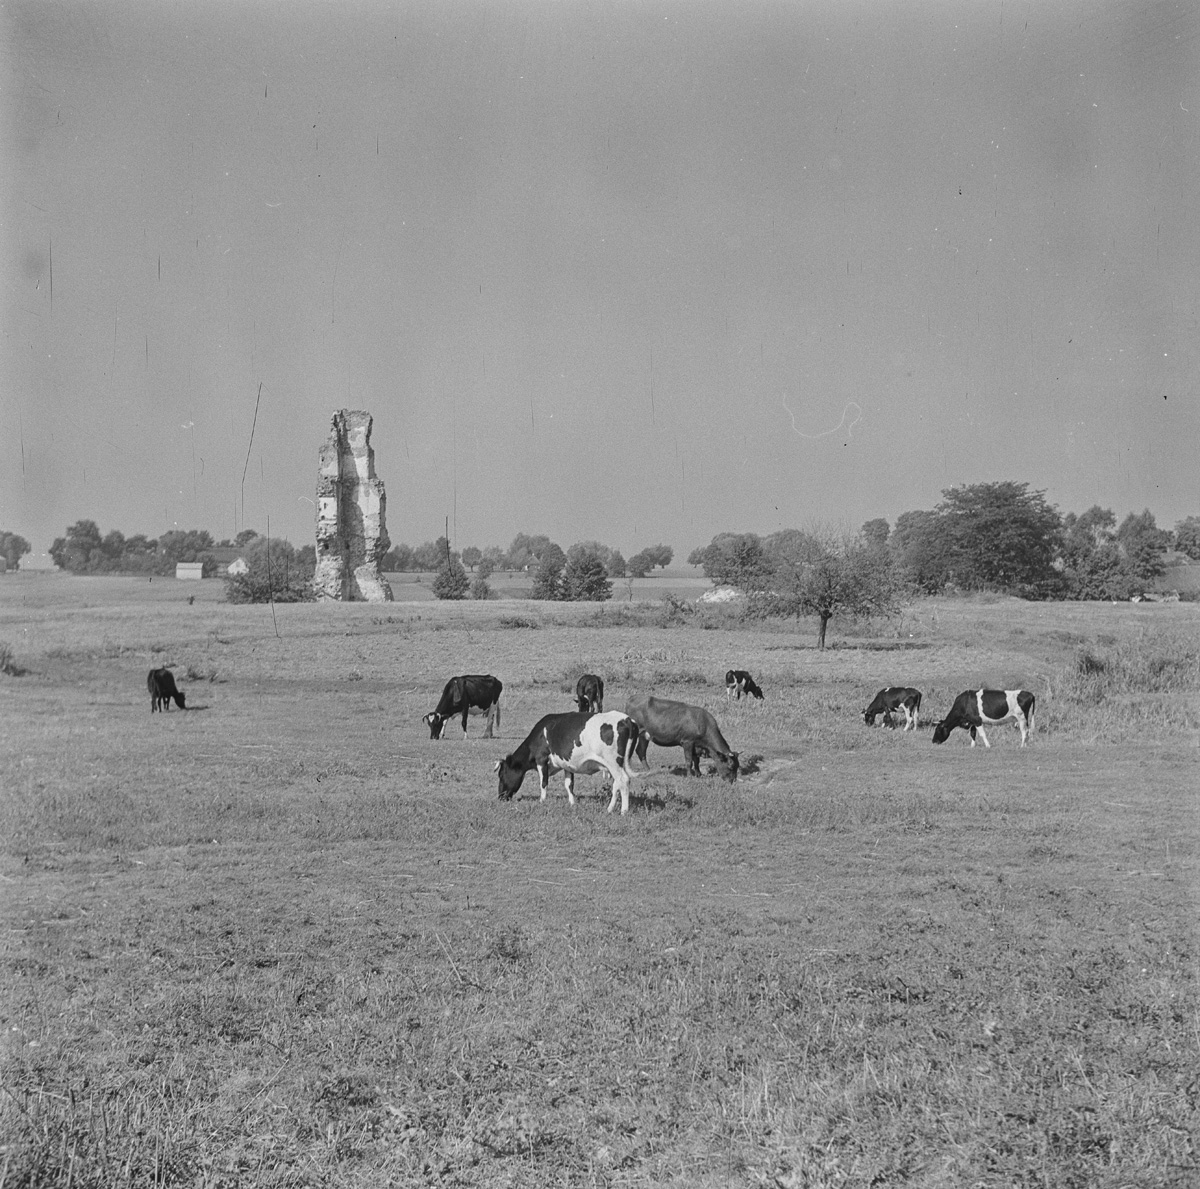 Zamek z pól z krowami